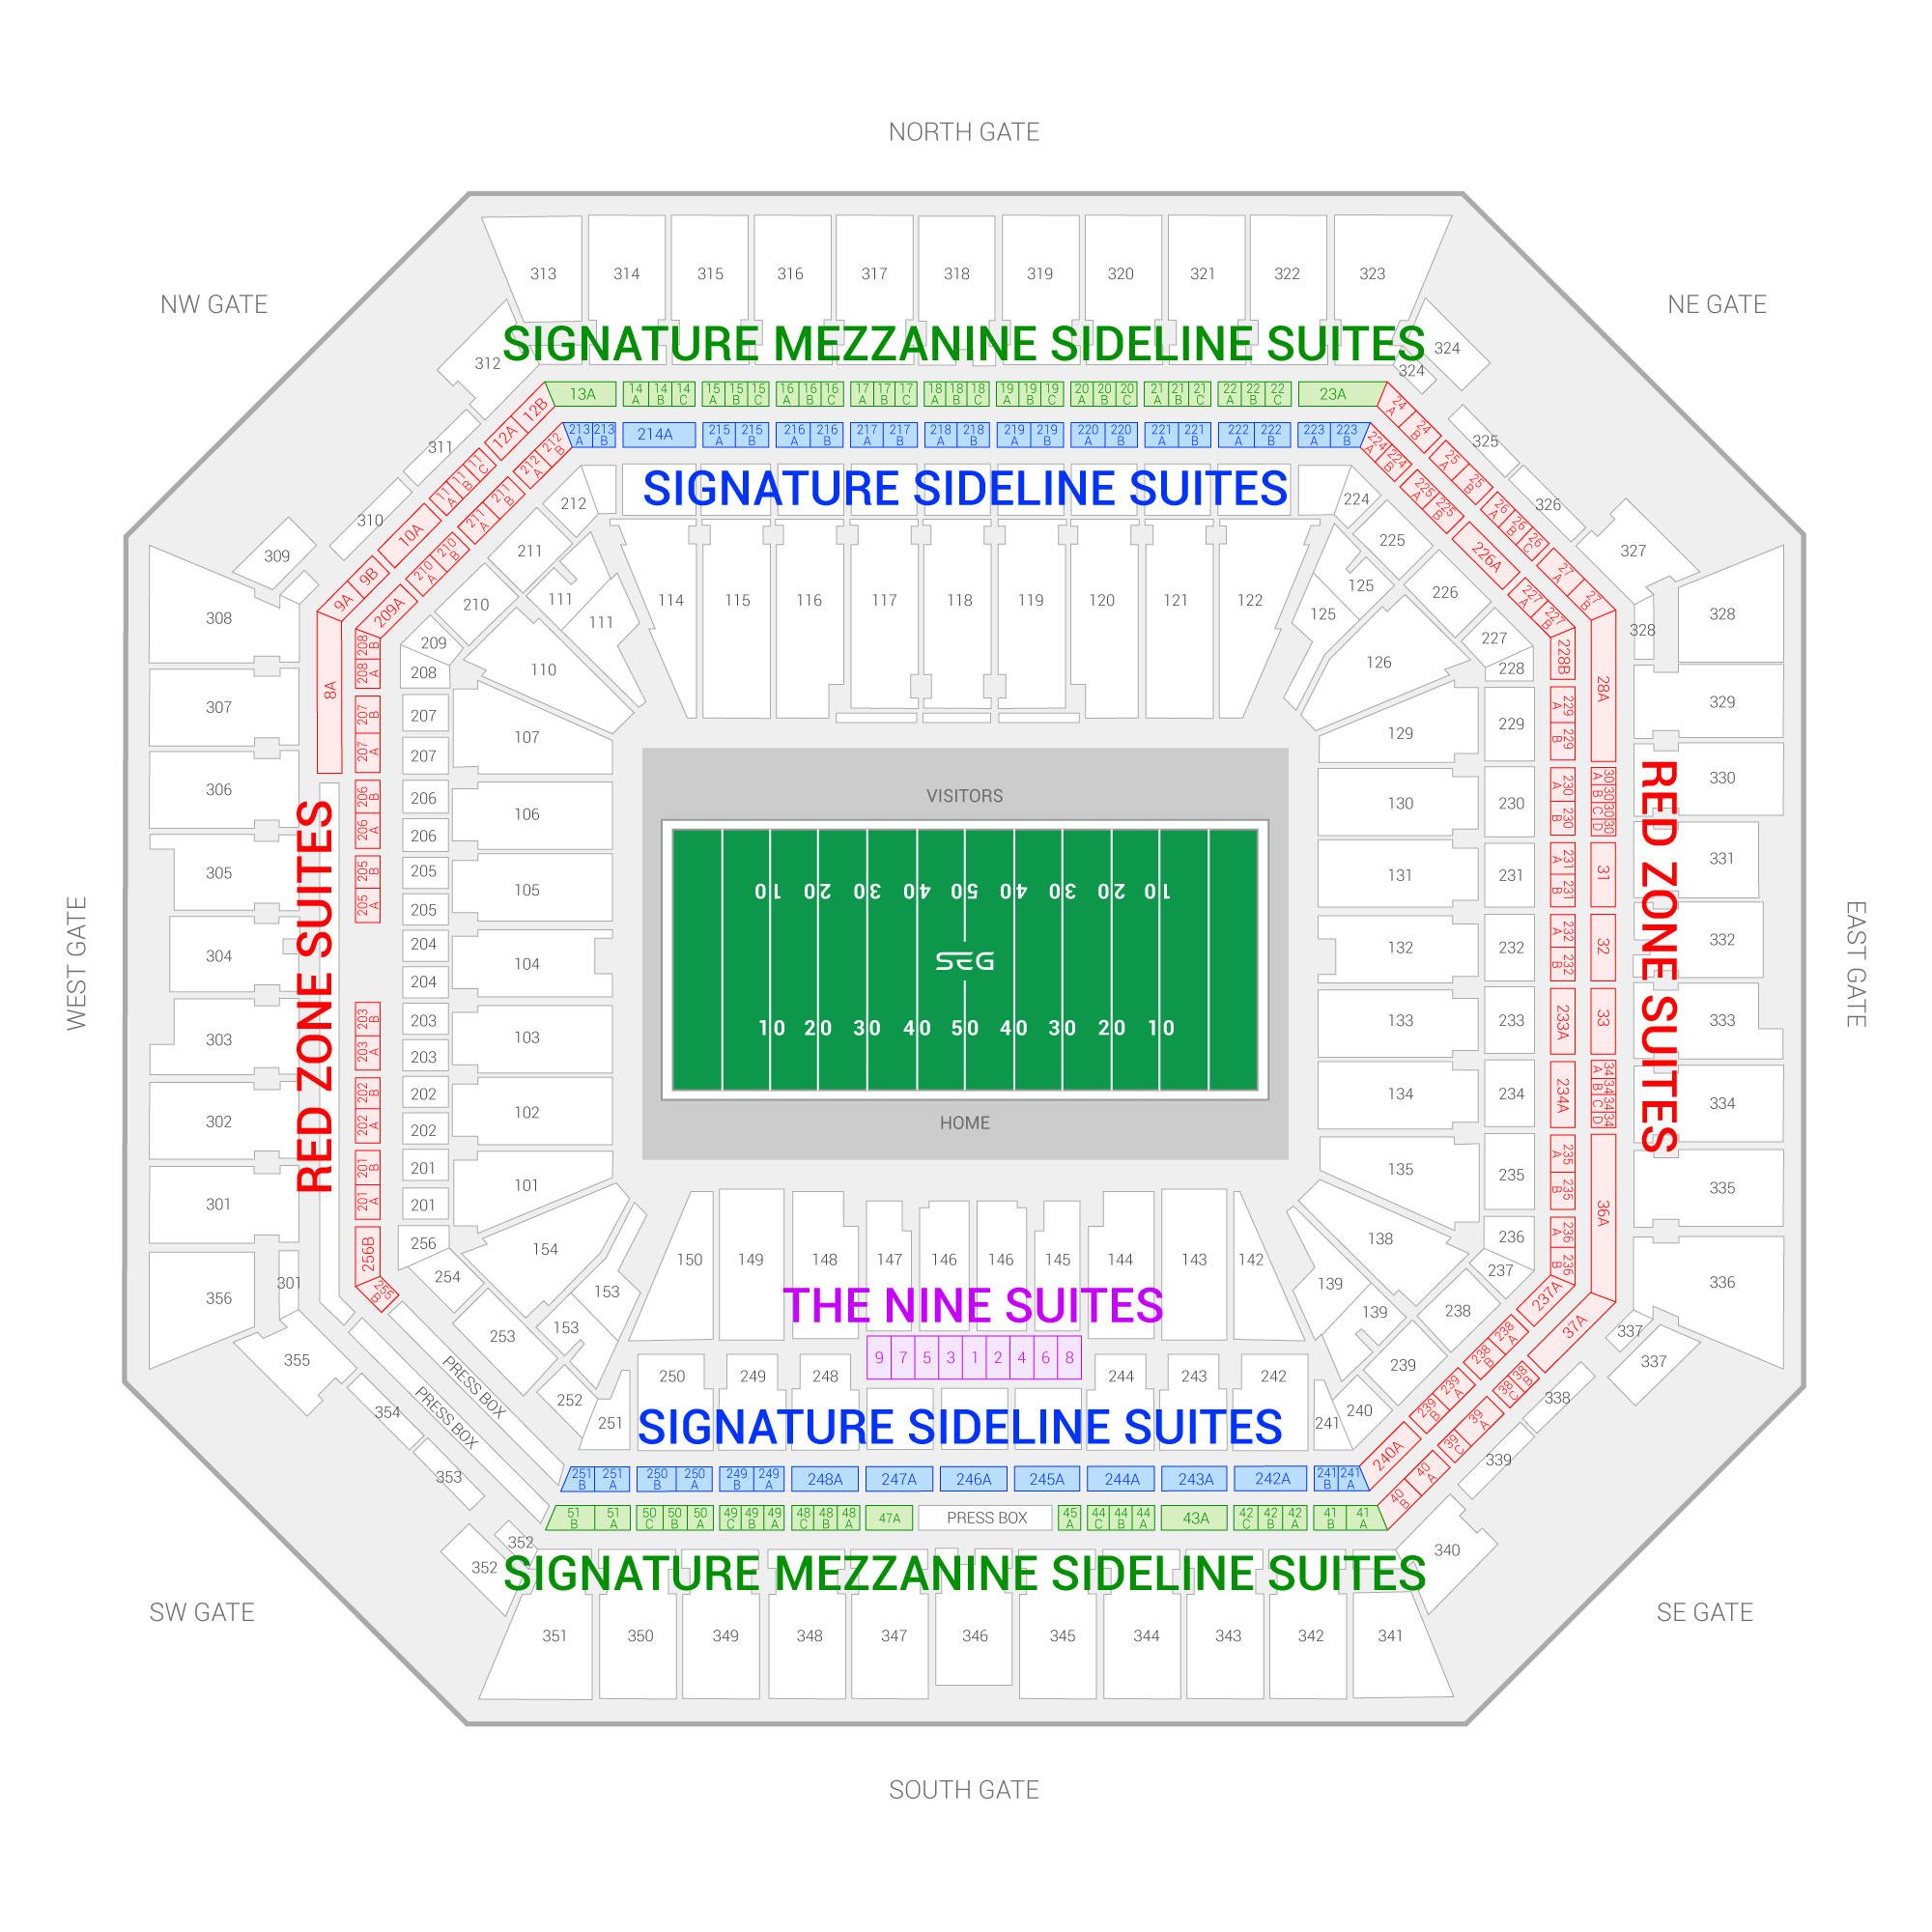 Hard Rock Stadium / Capital One Orange Bowl Suite Map and Seating Chart